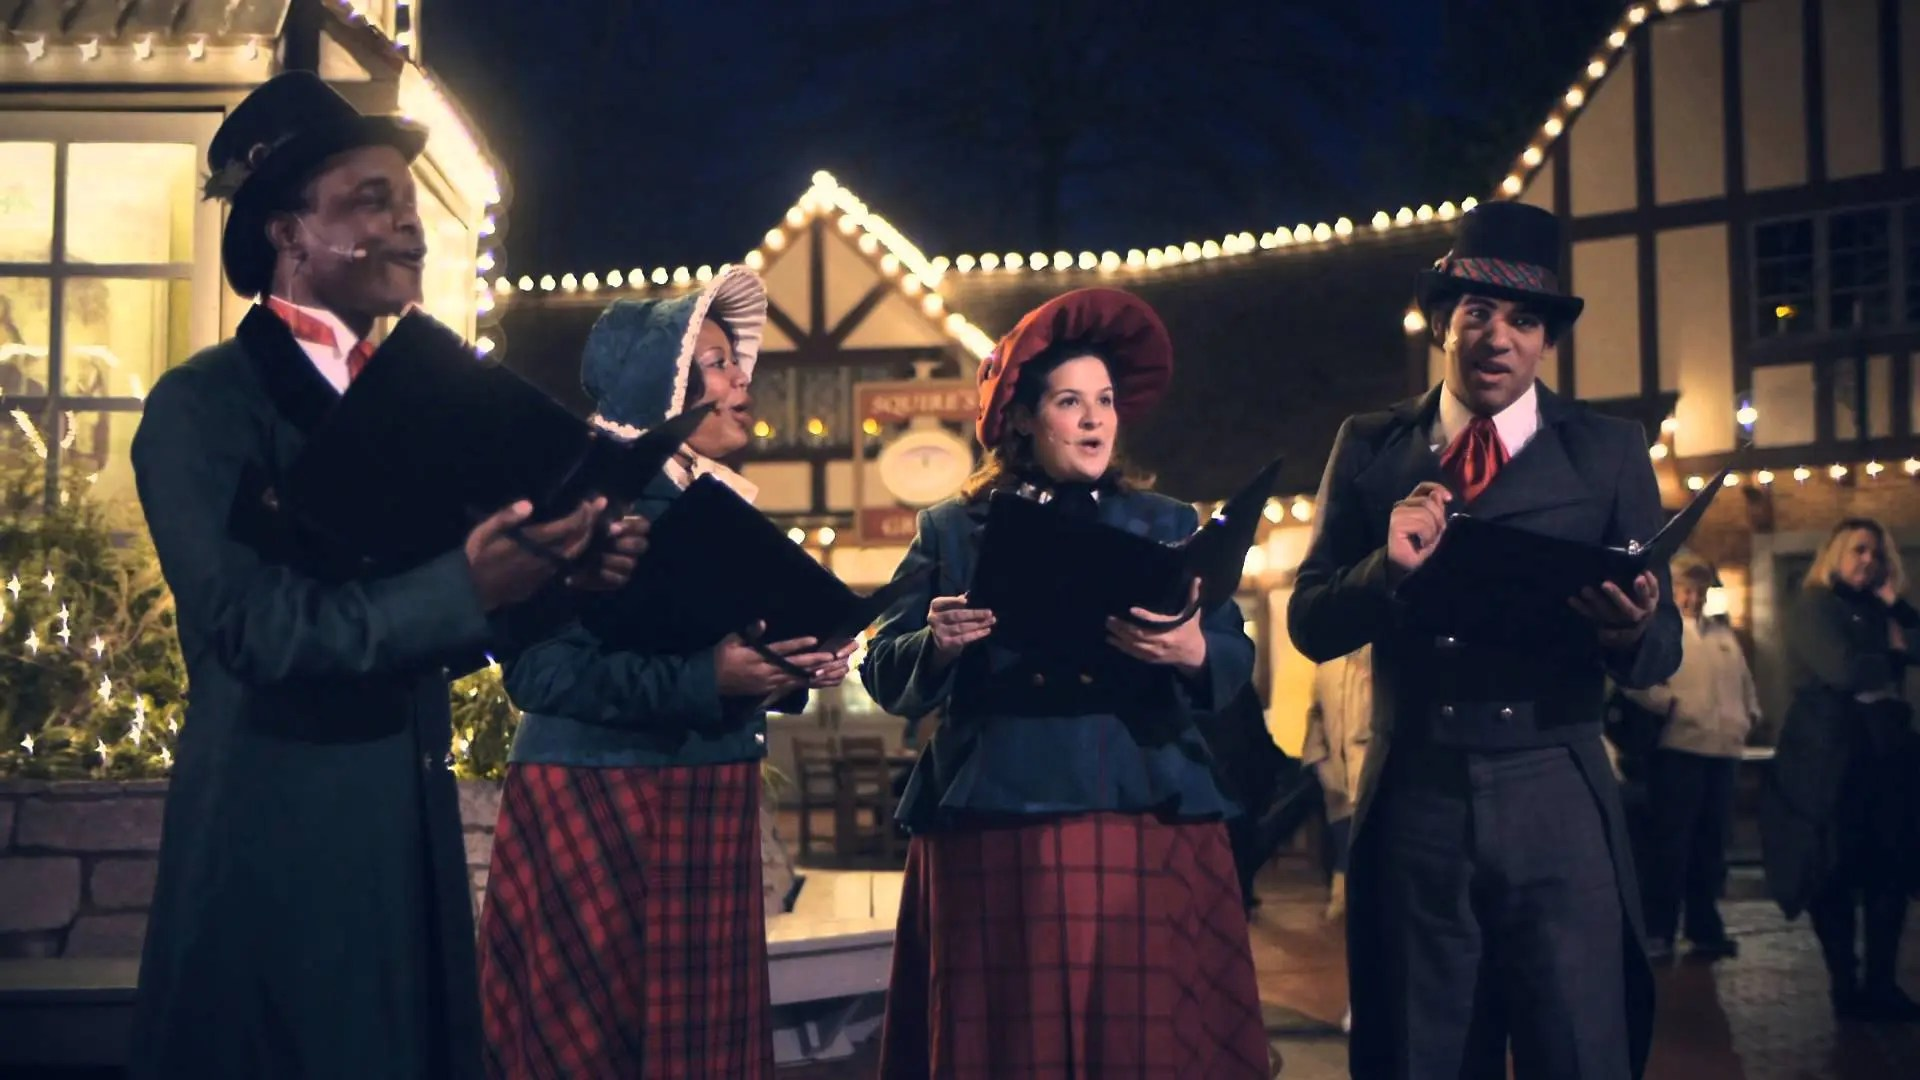 Christmas Traditions at Busch Gardens Williamsburg, VA